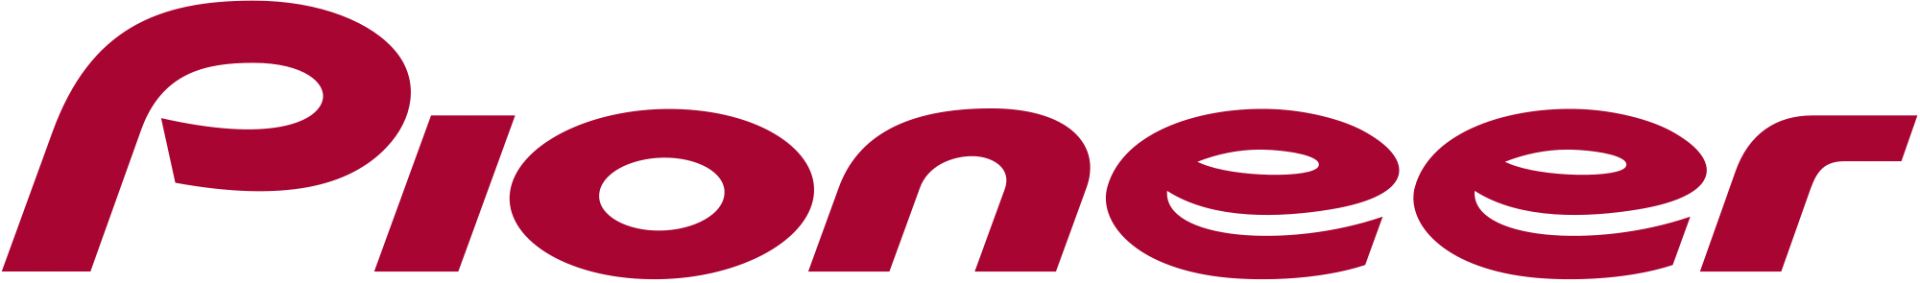 Pioneer logo red